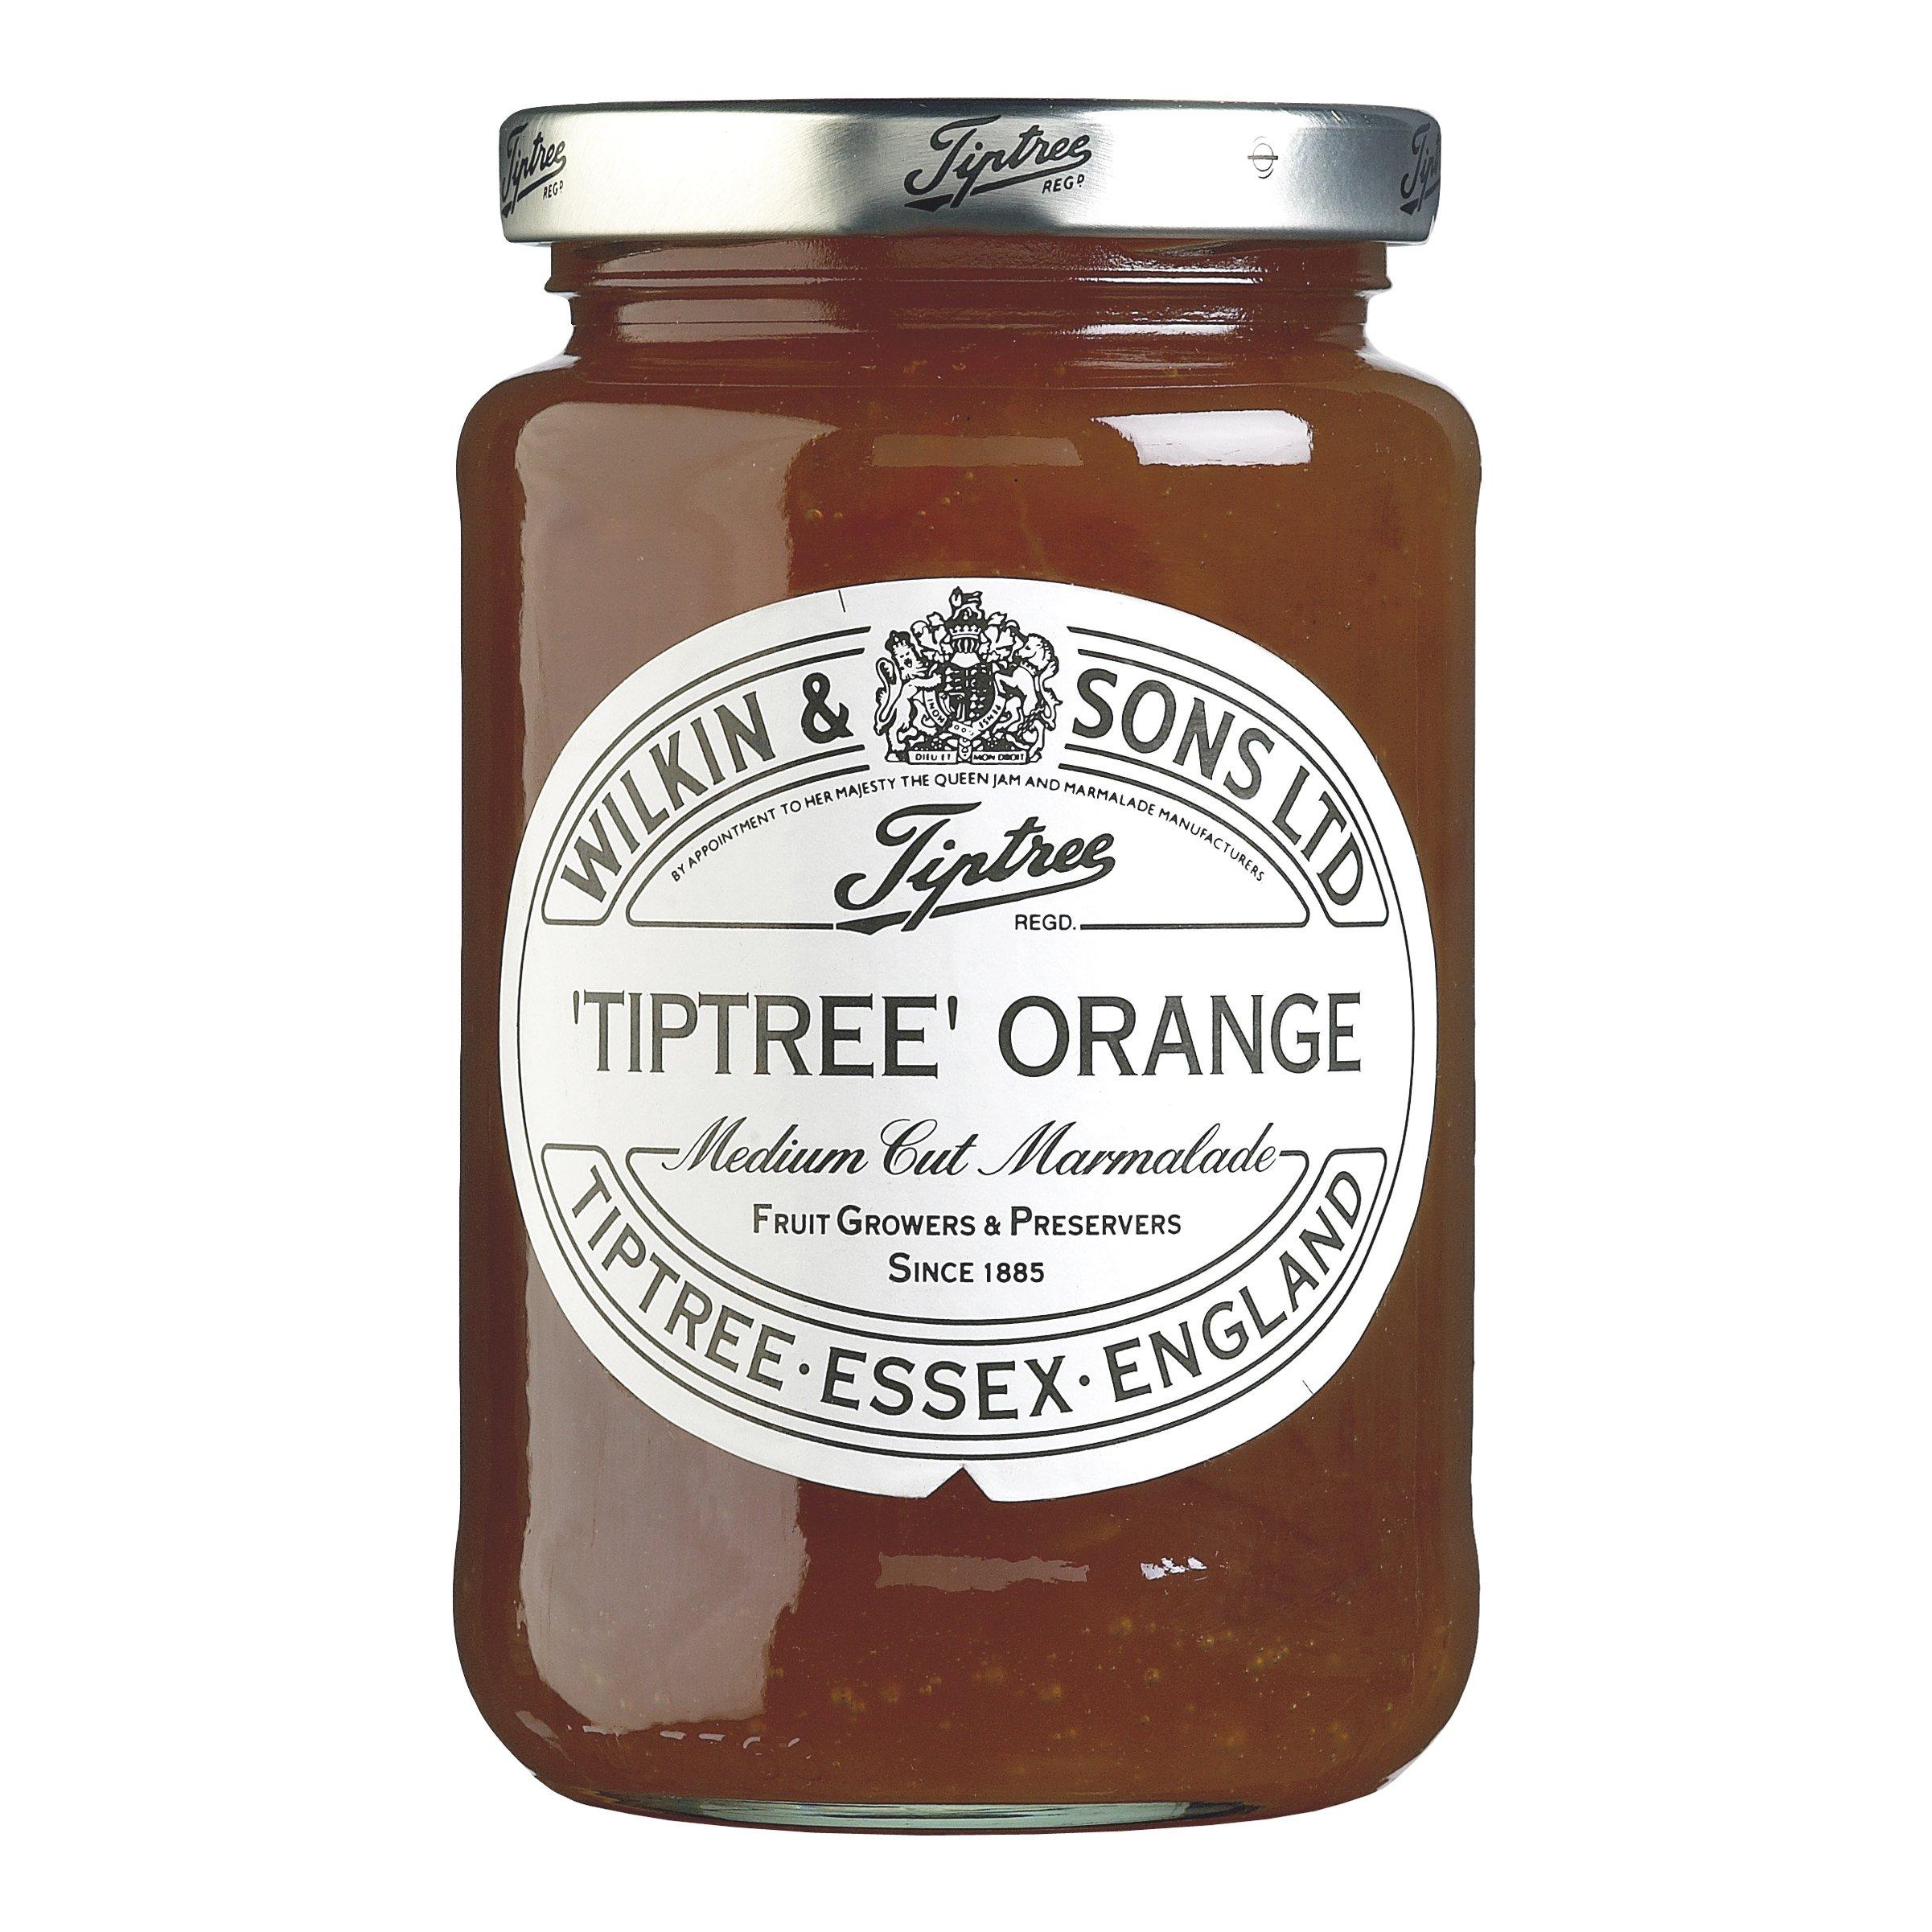 Tiptree Orange Marmalade, 12-Ounce Jars (Pack of 6)